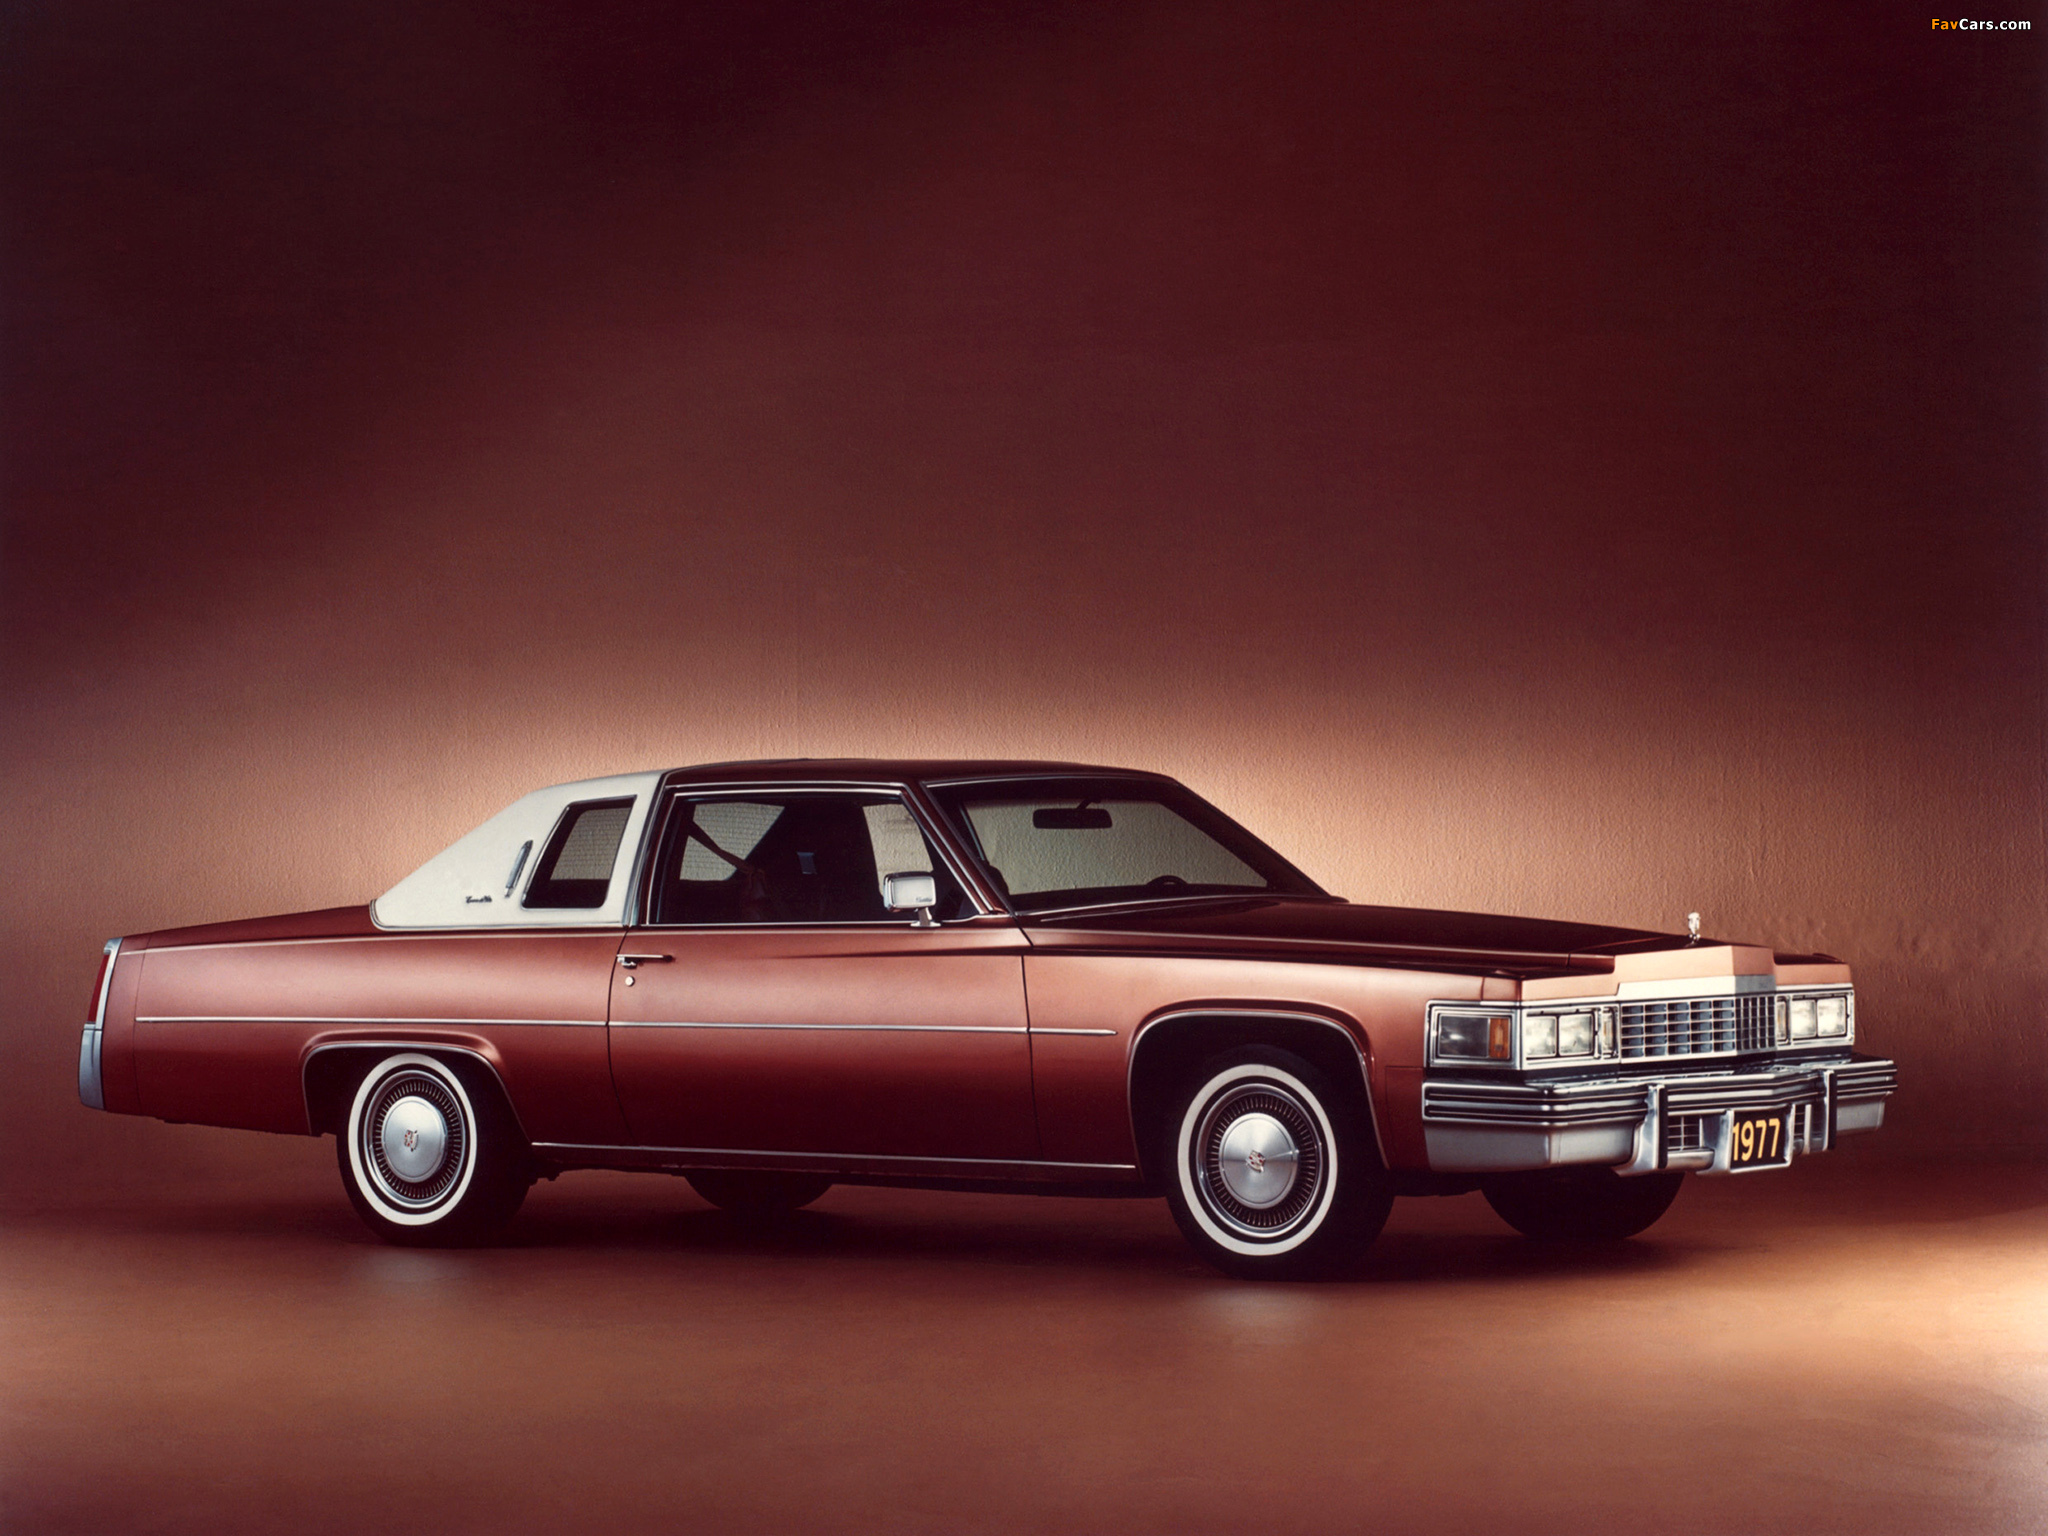 Pictures of Cadillac Coupe de Ville 1977 (2048 x 1536)